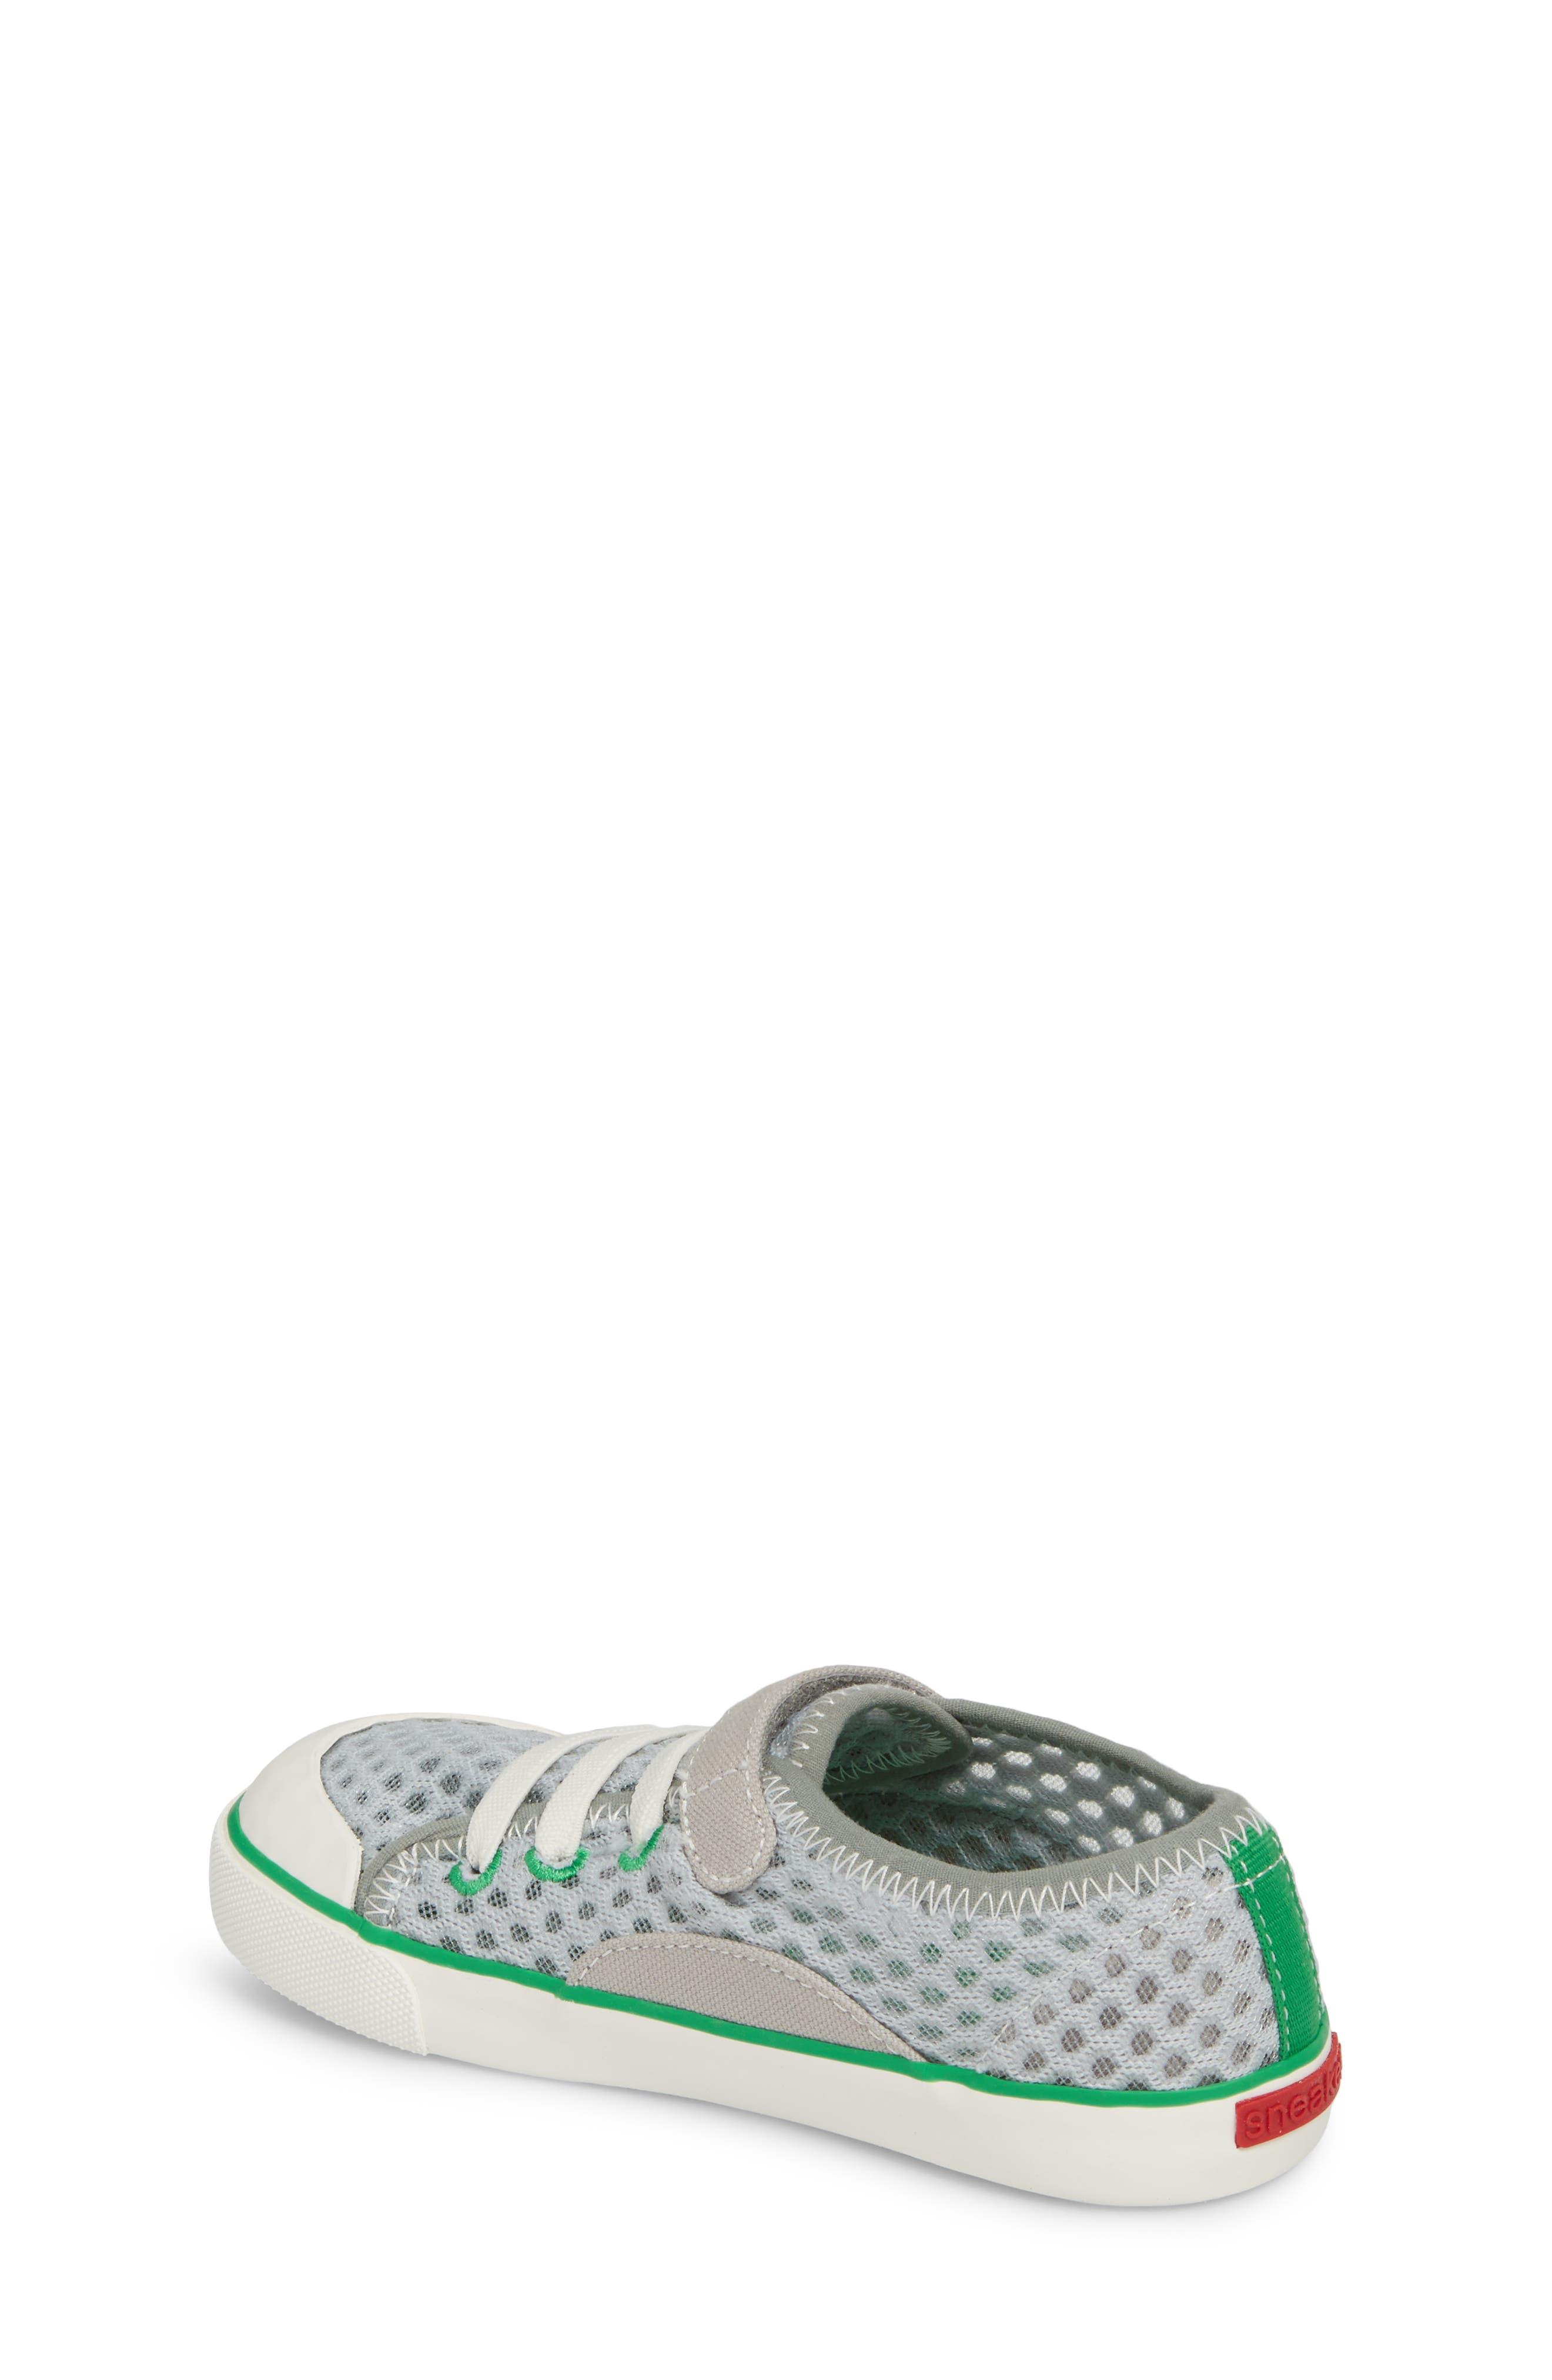 Saylor Sneaker,                             Alternate thumbnail 2, color,                             020